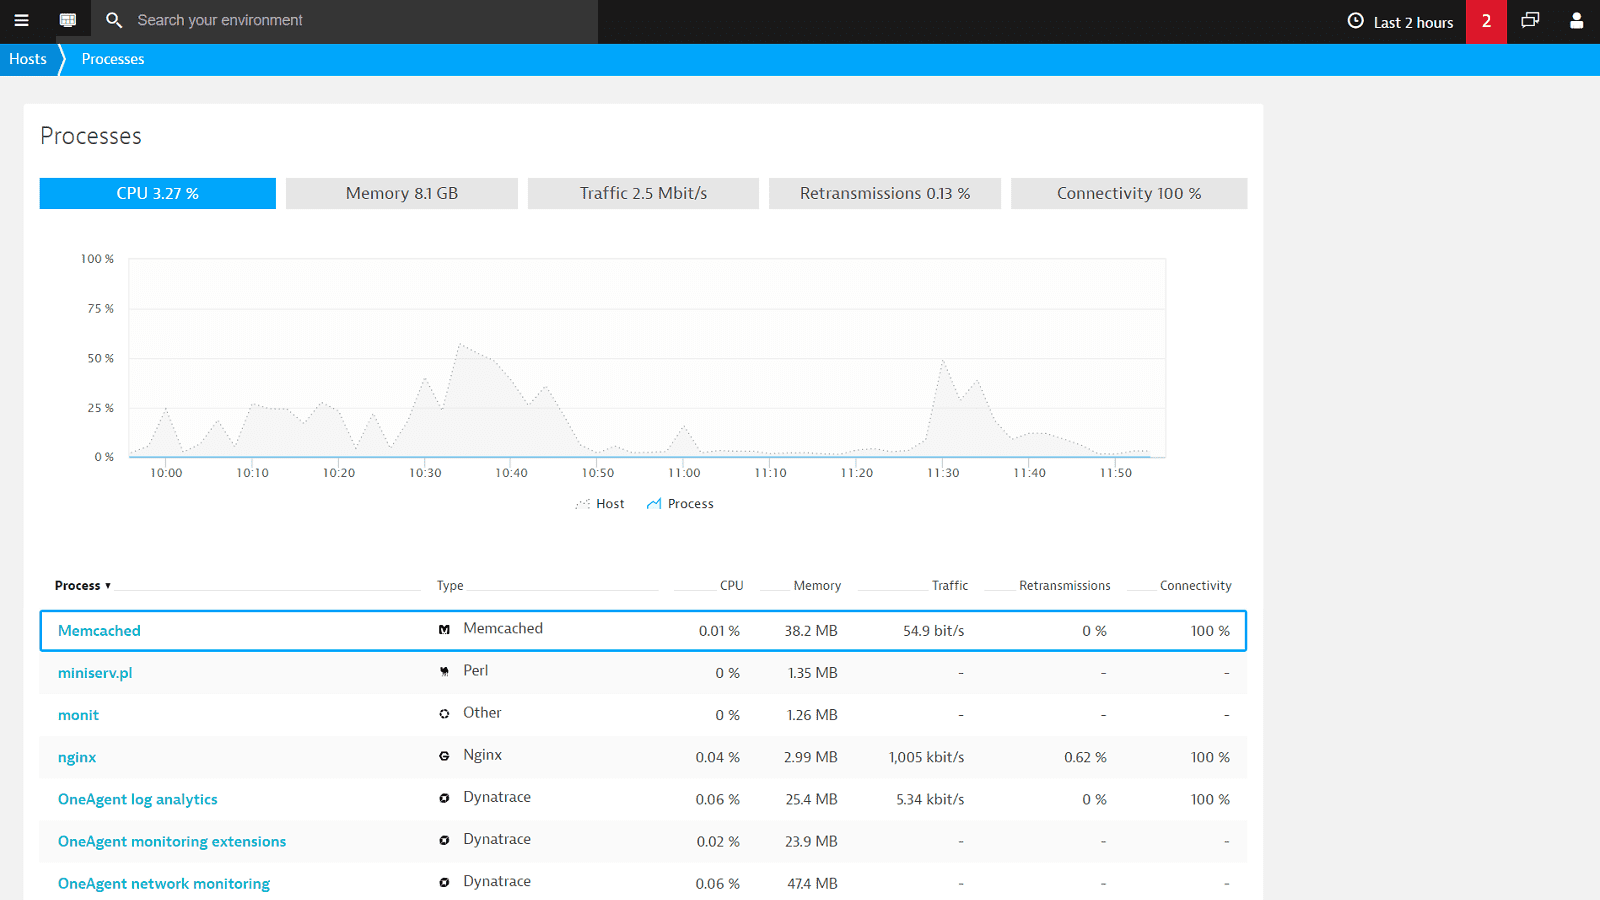 Memcached process metrics